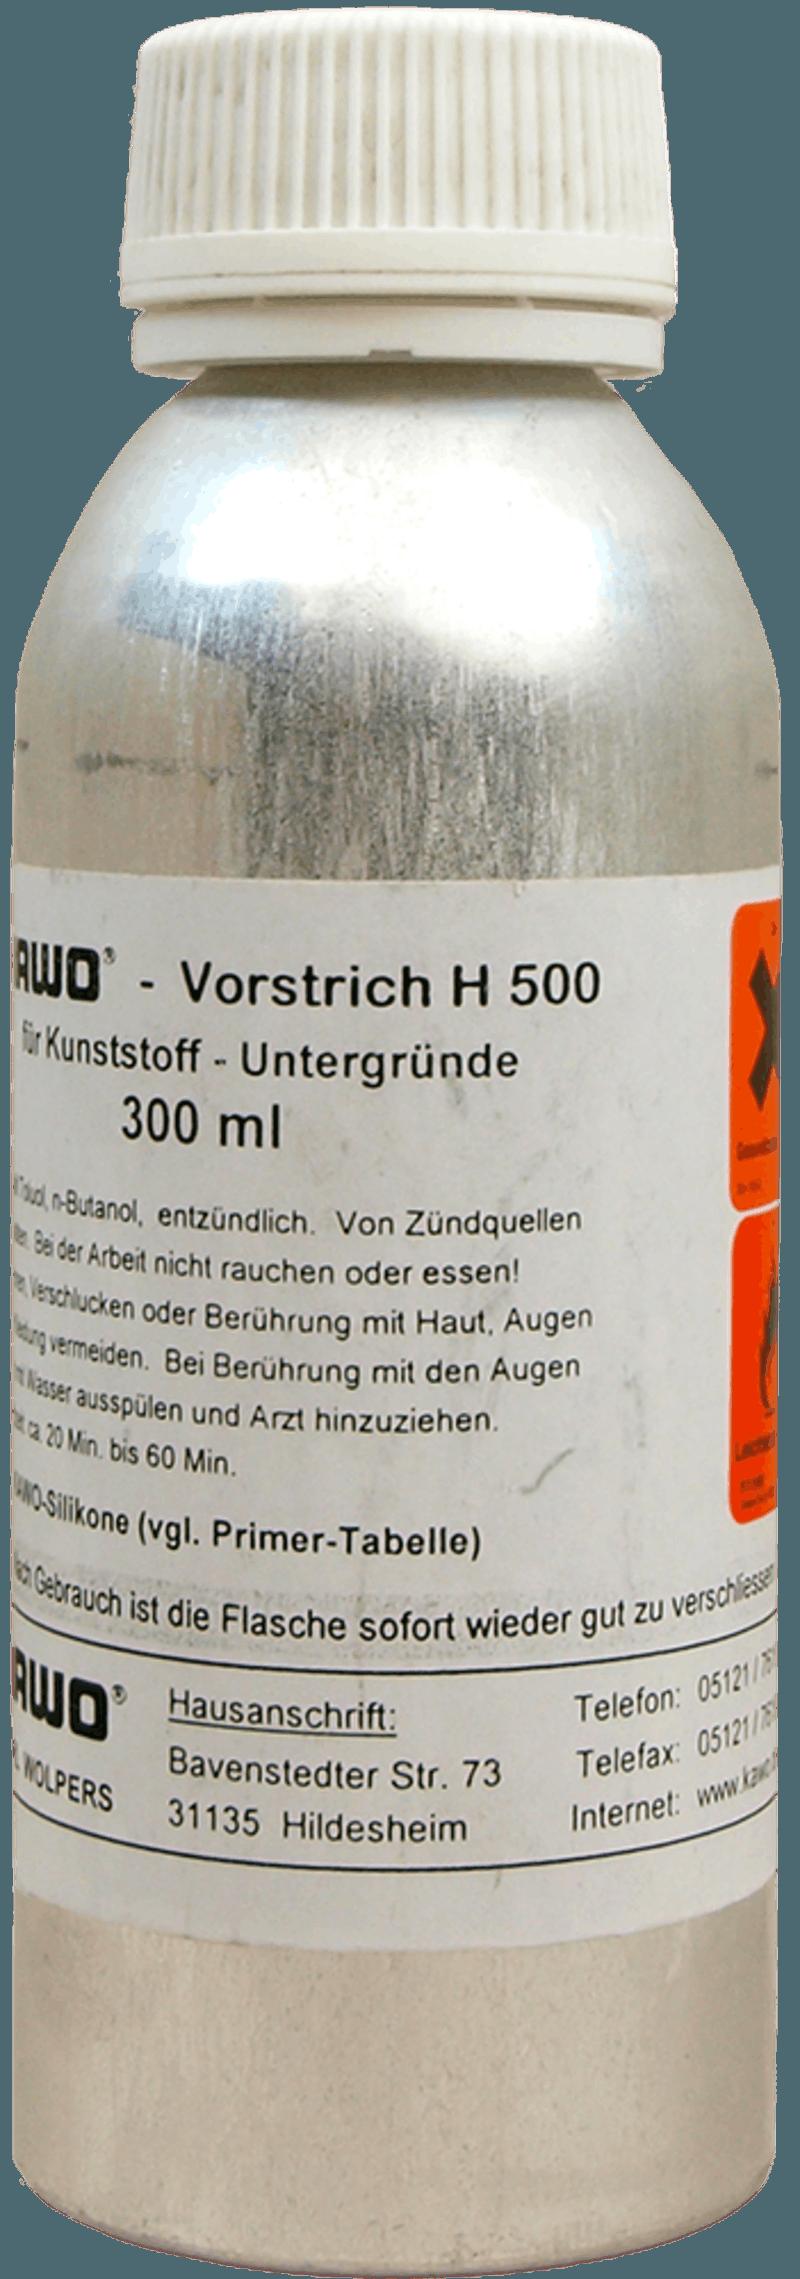 KAWO Vorstrich H 500